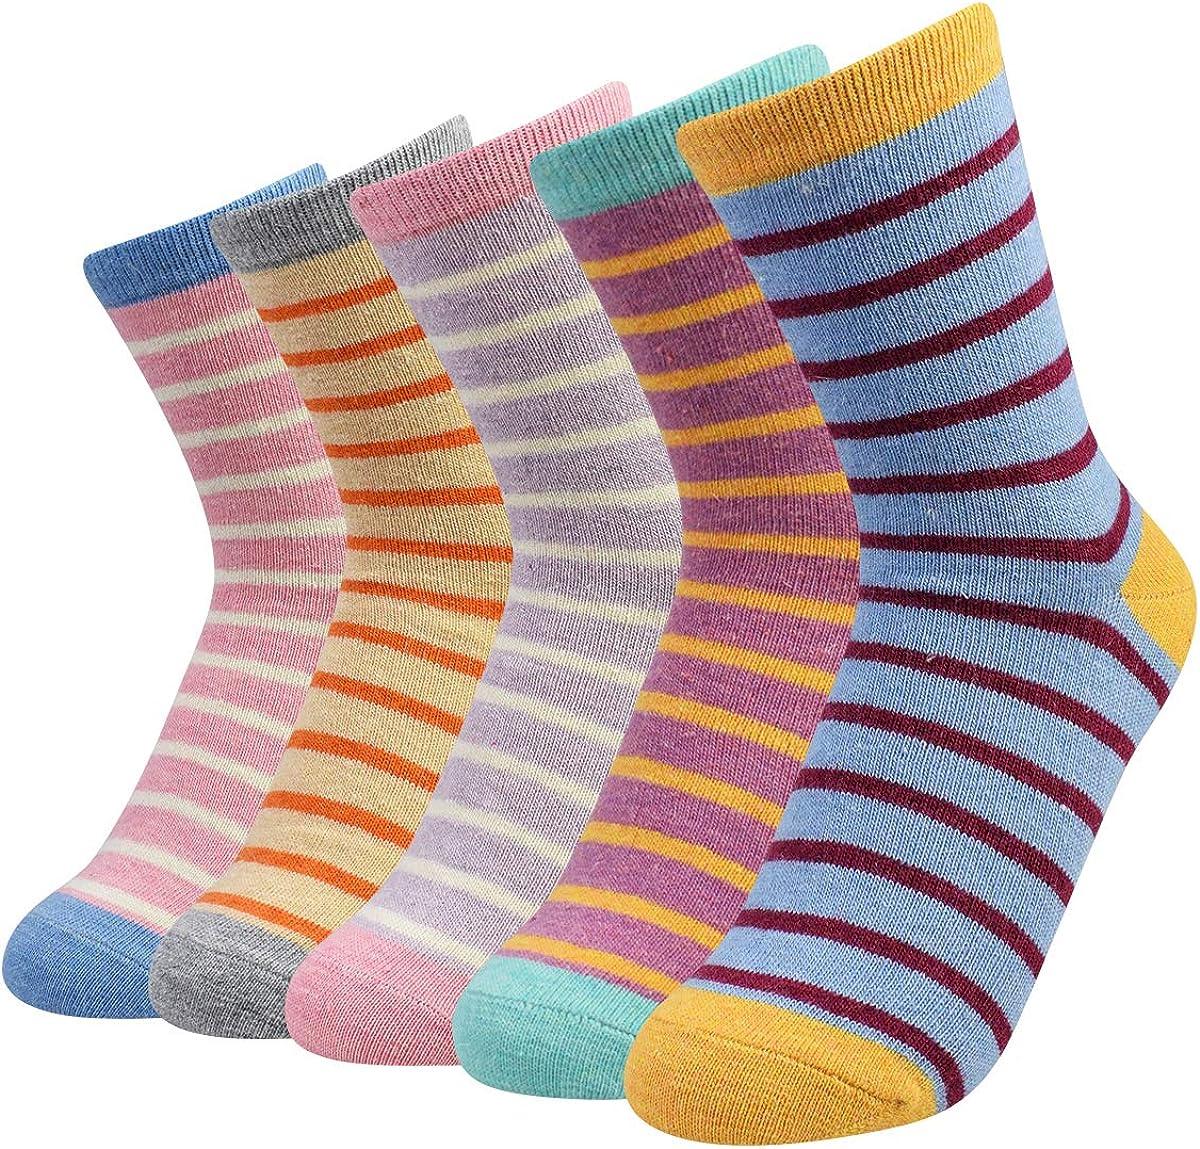 Thermal Wool Socks for Women Winter Warm Crew Socks Comfy Soft Casual Knit Boot Socks 5 Pack